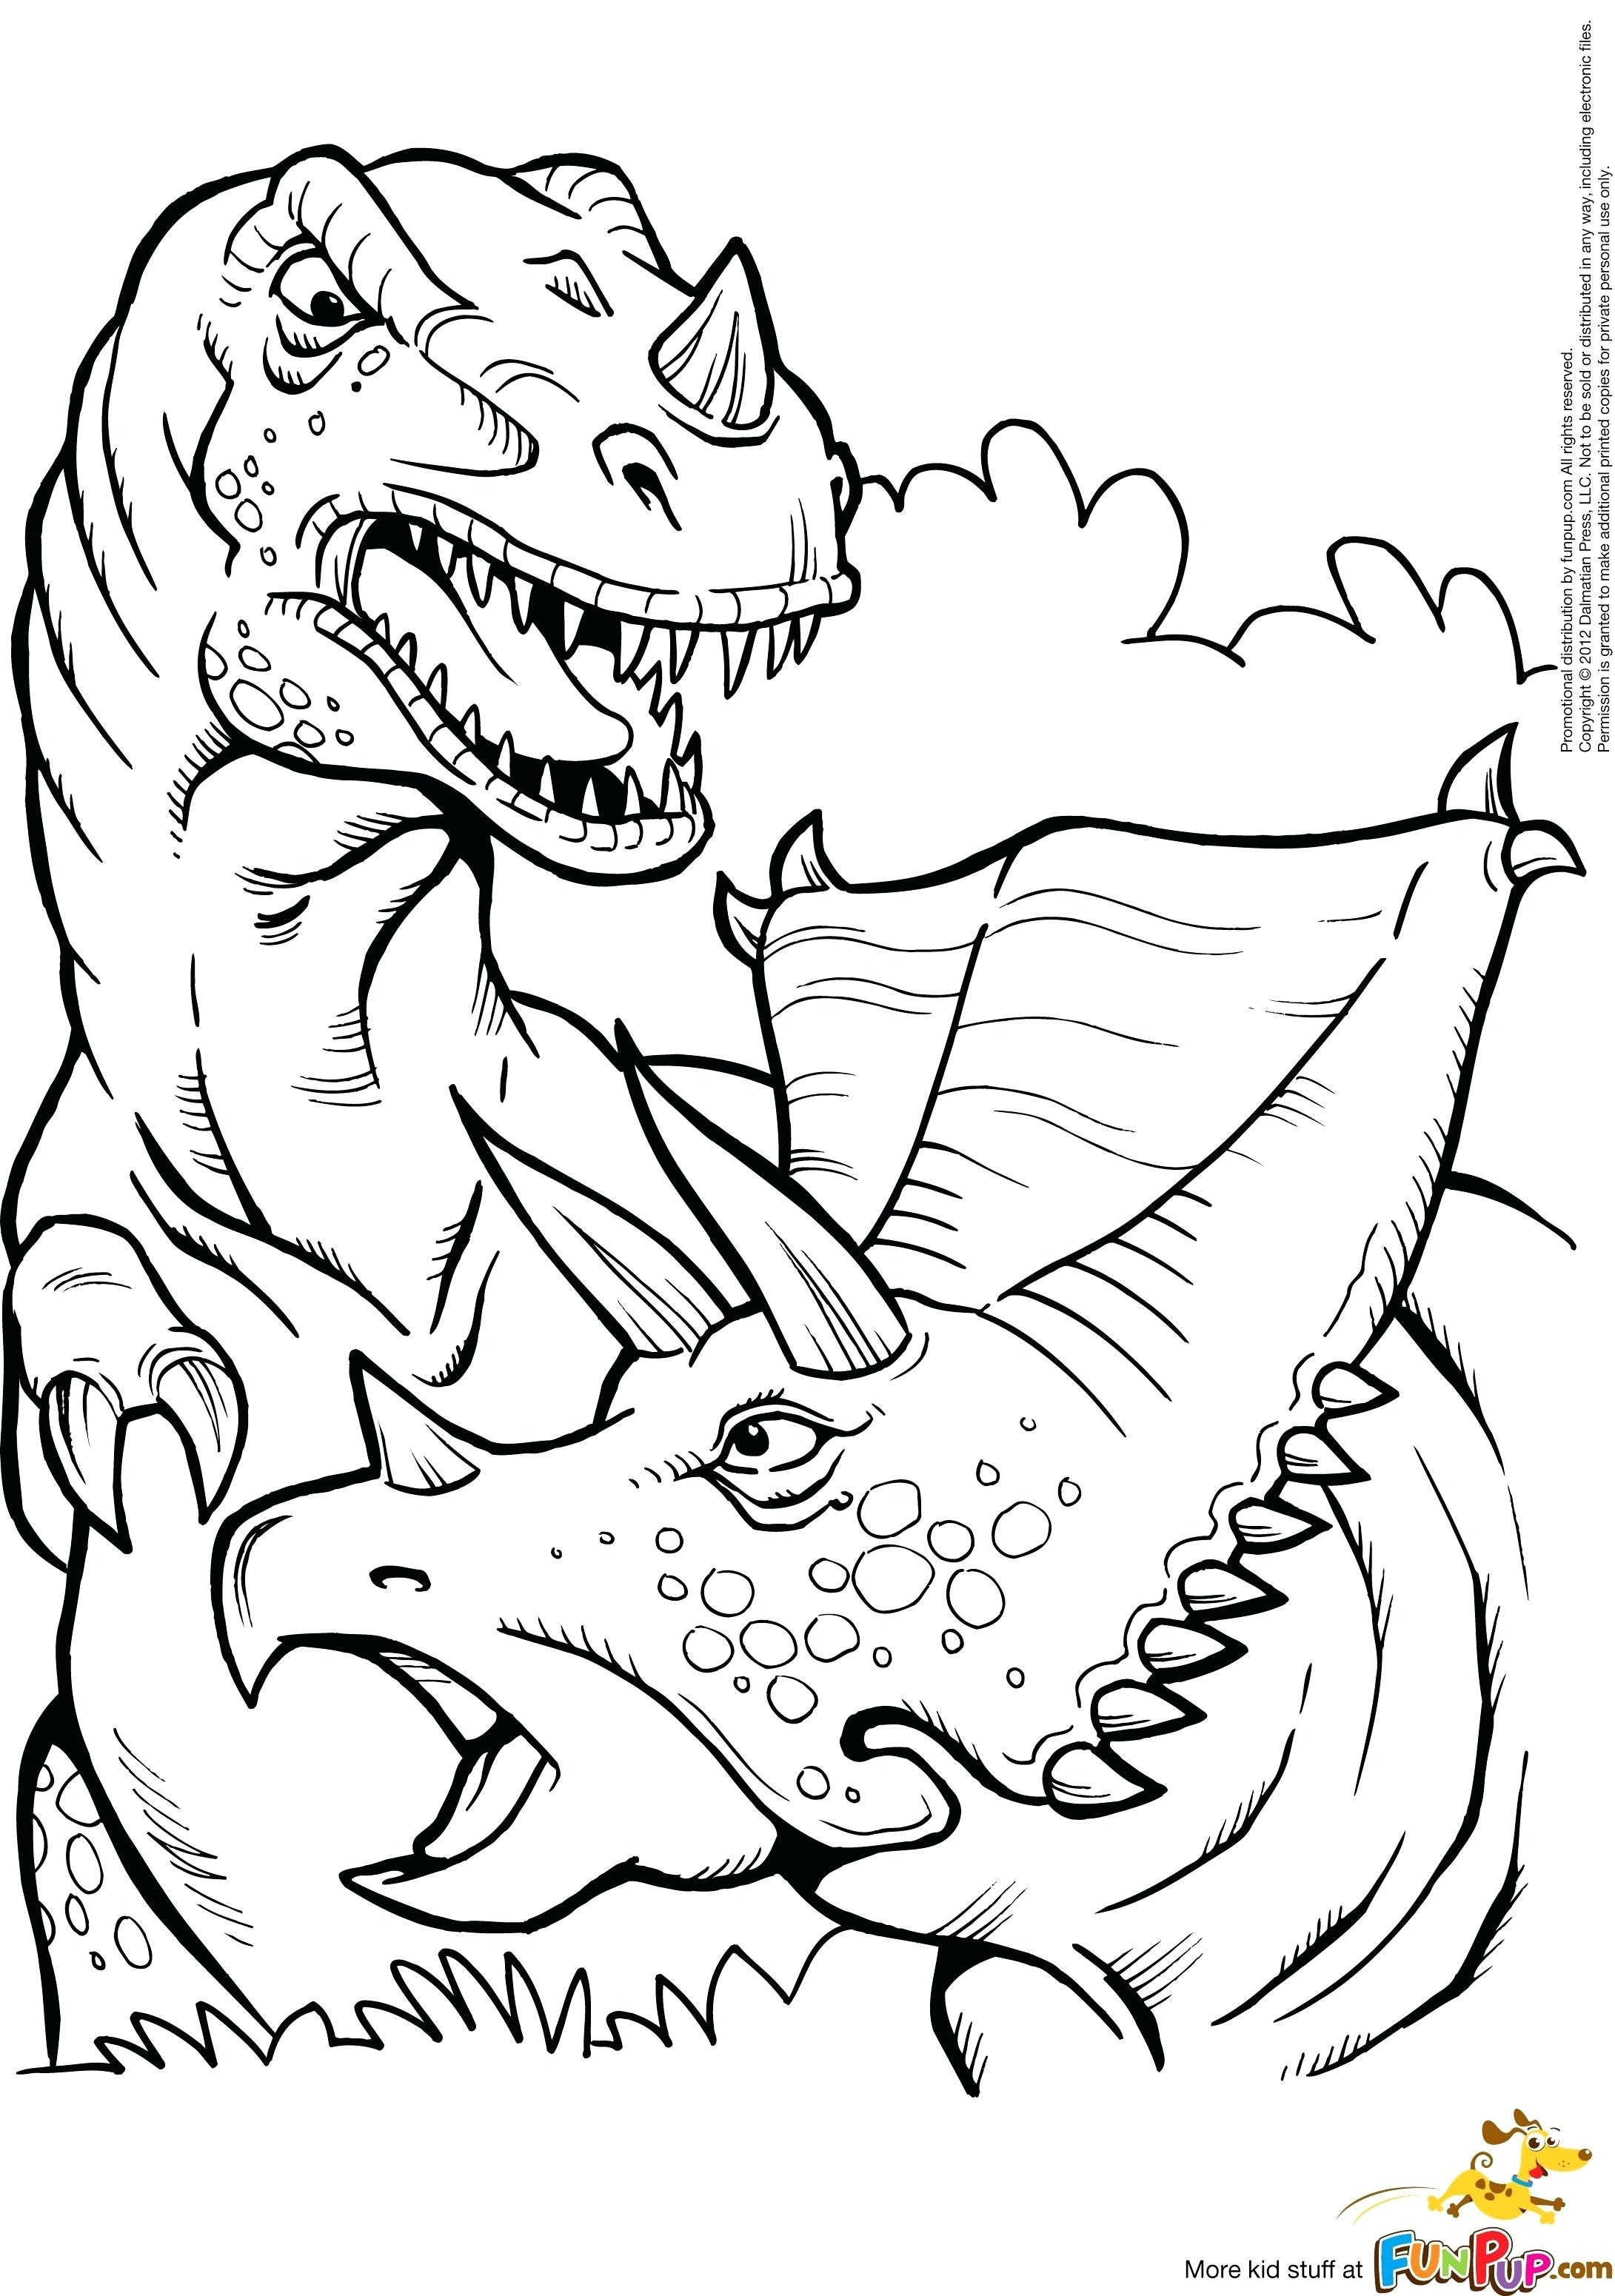 2181x3101 Coloring Pages T Rex Coloring Page Captain Rex Coloring Pages